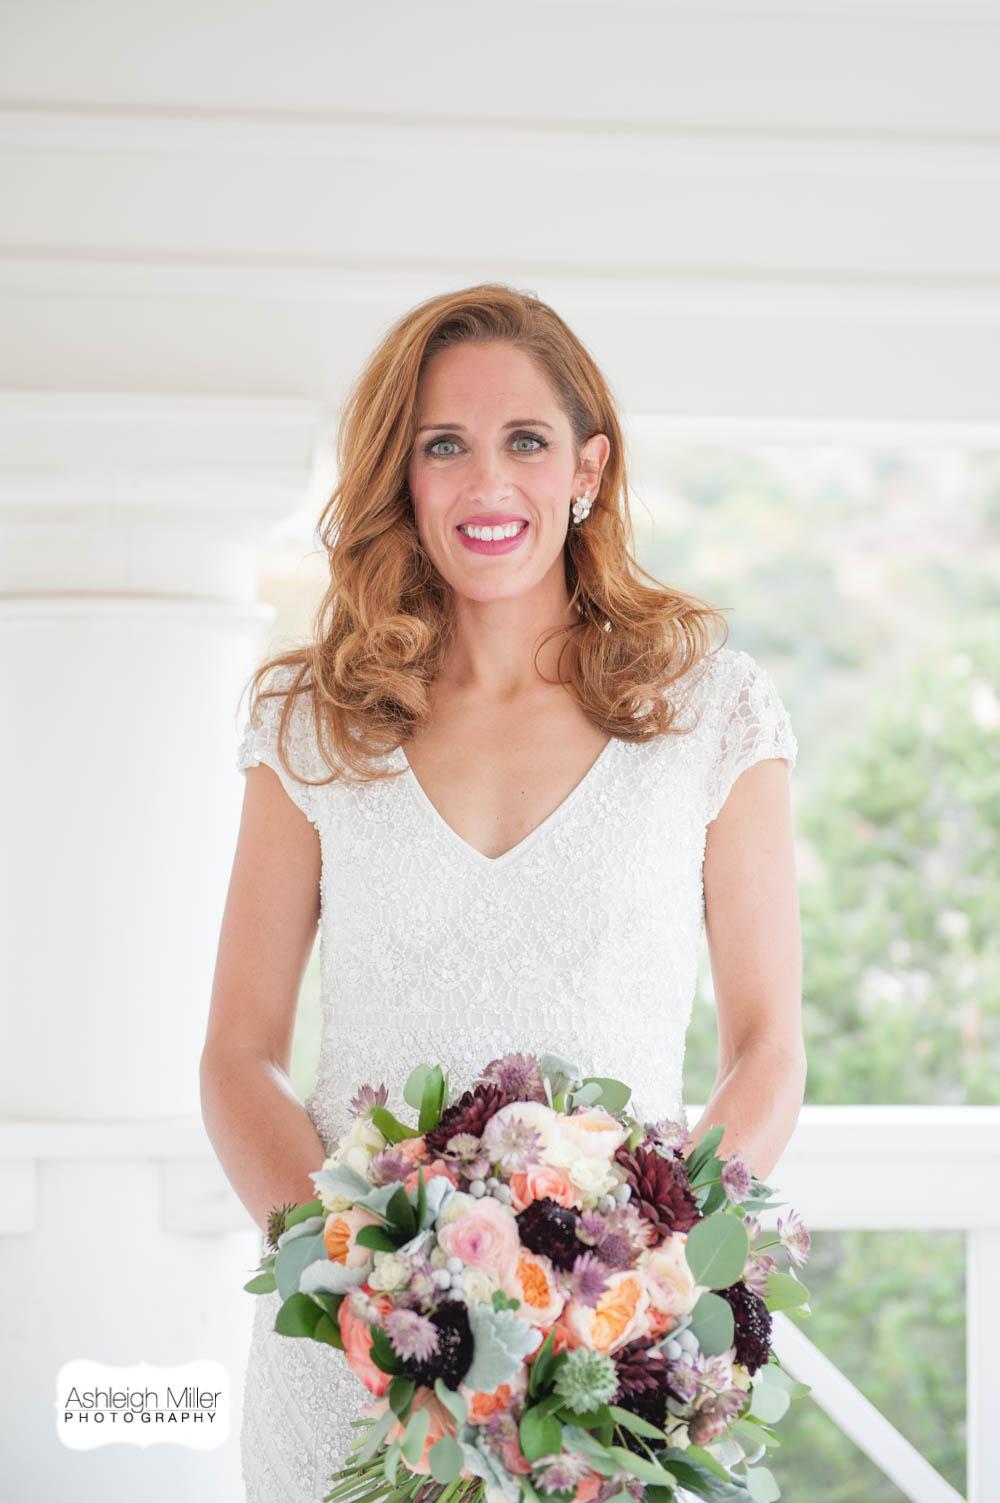 AMW-Wedding-EmilyRyan-WillowRidgeManor-4623-Blog.jpg